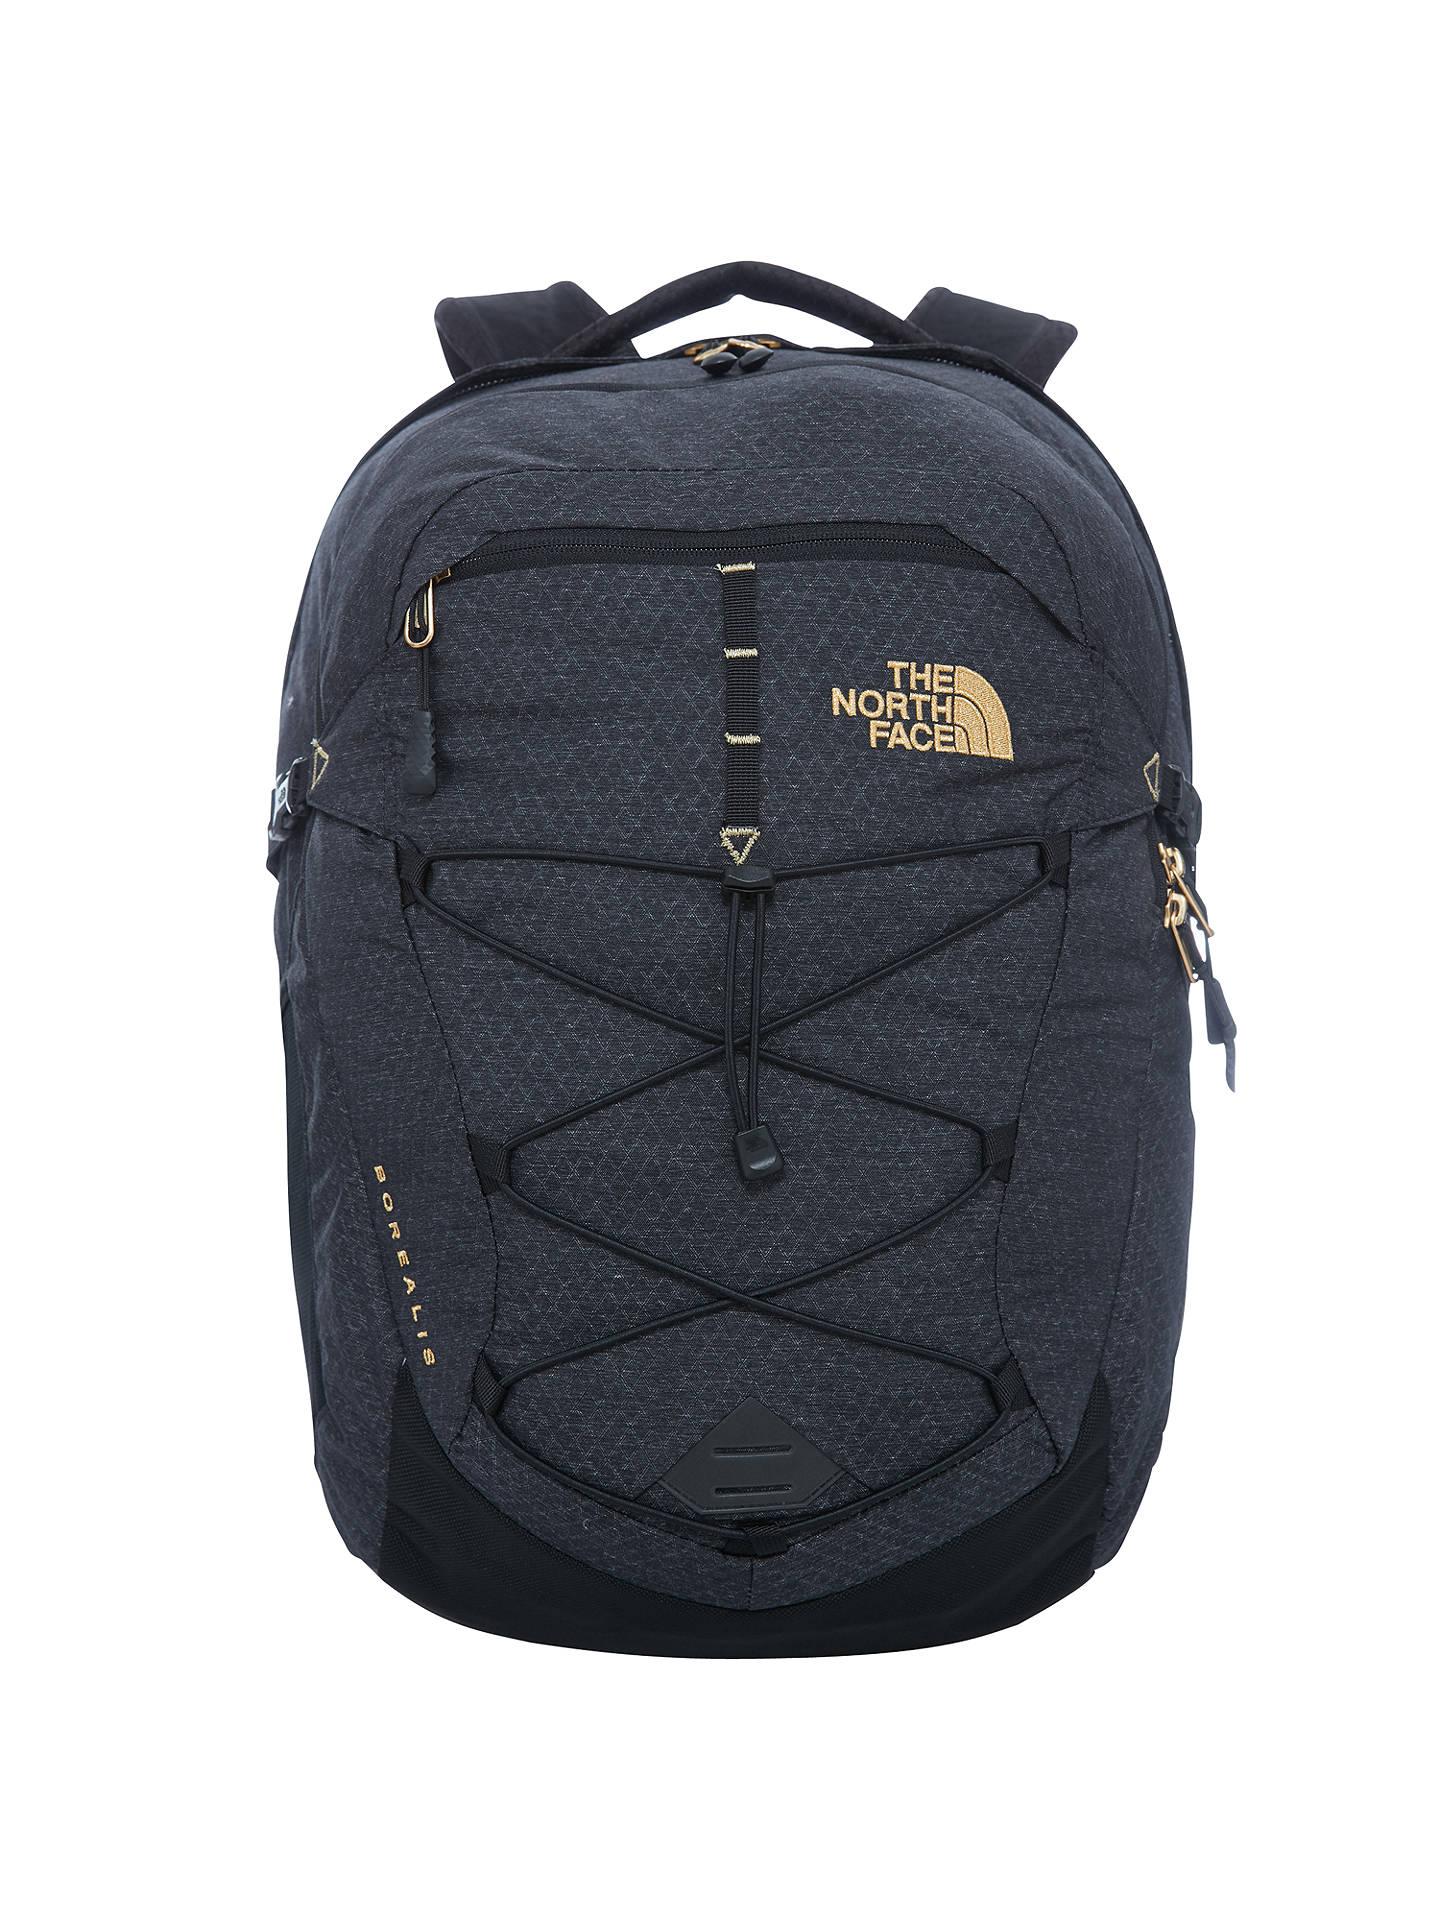 217eb5fb3 The North Face Borealis Backpack, Black/Gold at John Lewis & Partners